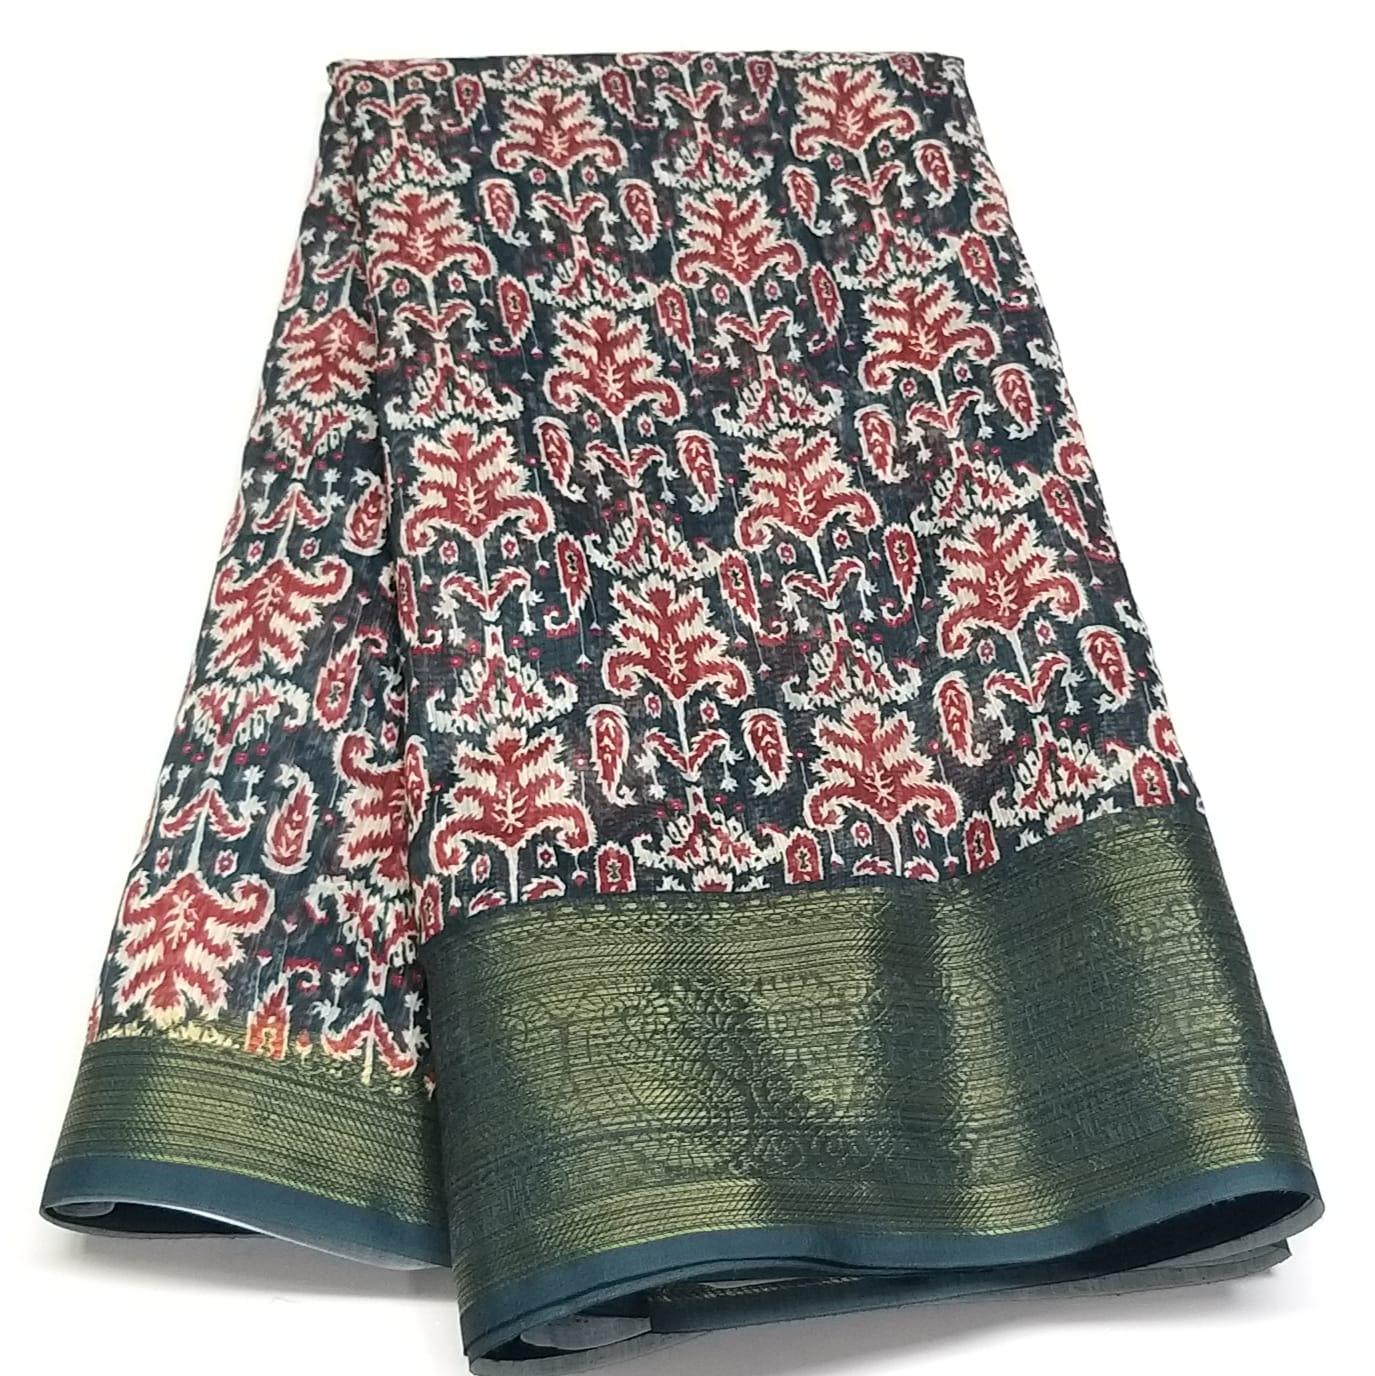 Rambha-1 Dark Black Cotton Saree